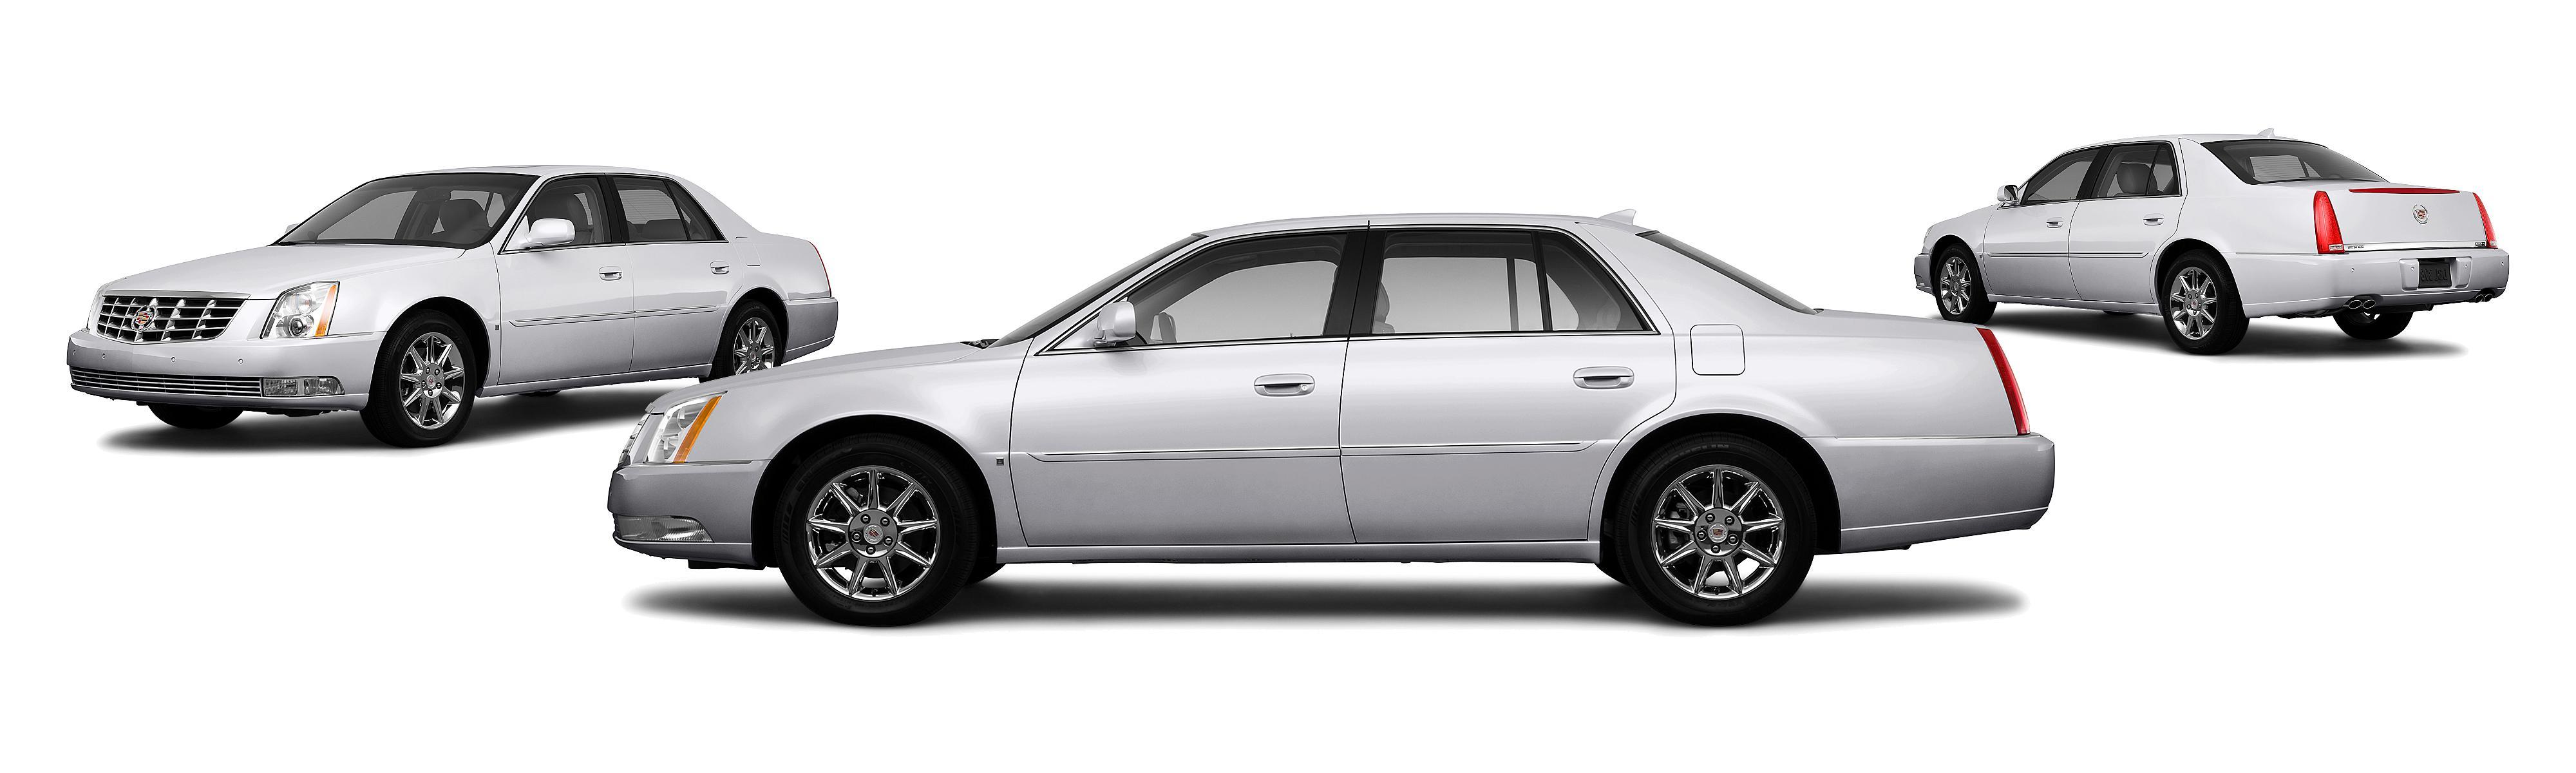 to cadillac used westcoast home bonita cars resized dts auto luxury